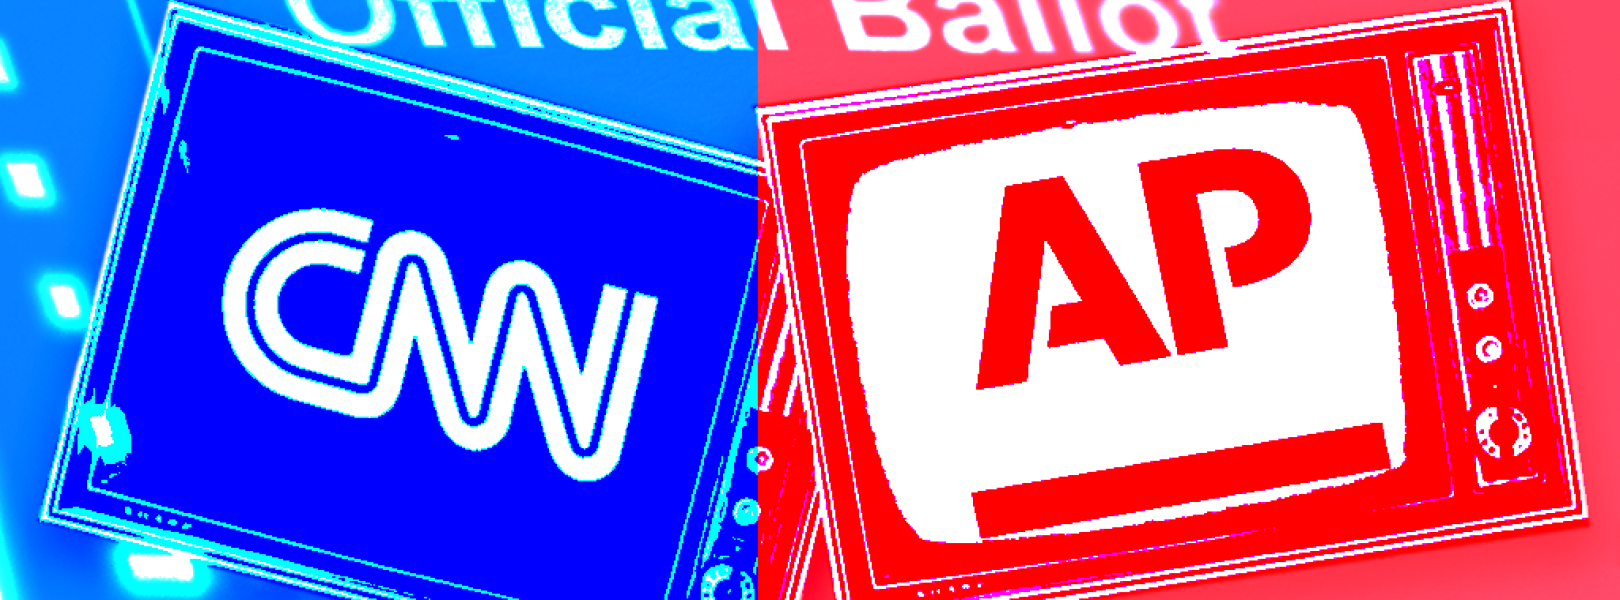 CNN and AP logos